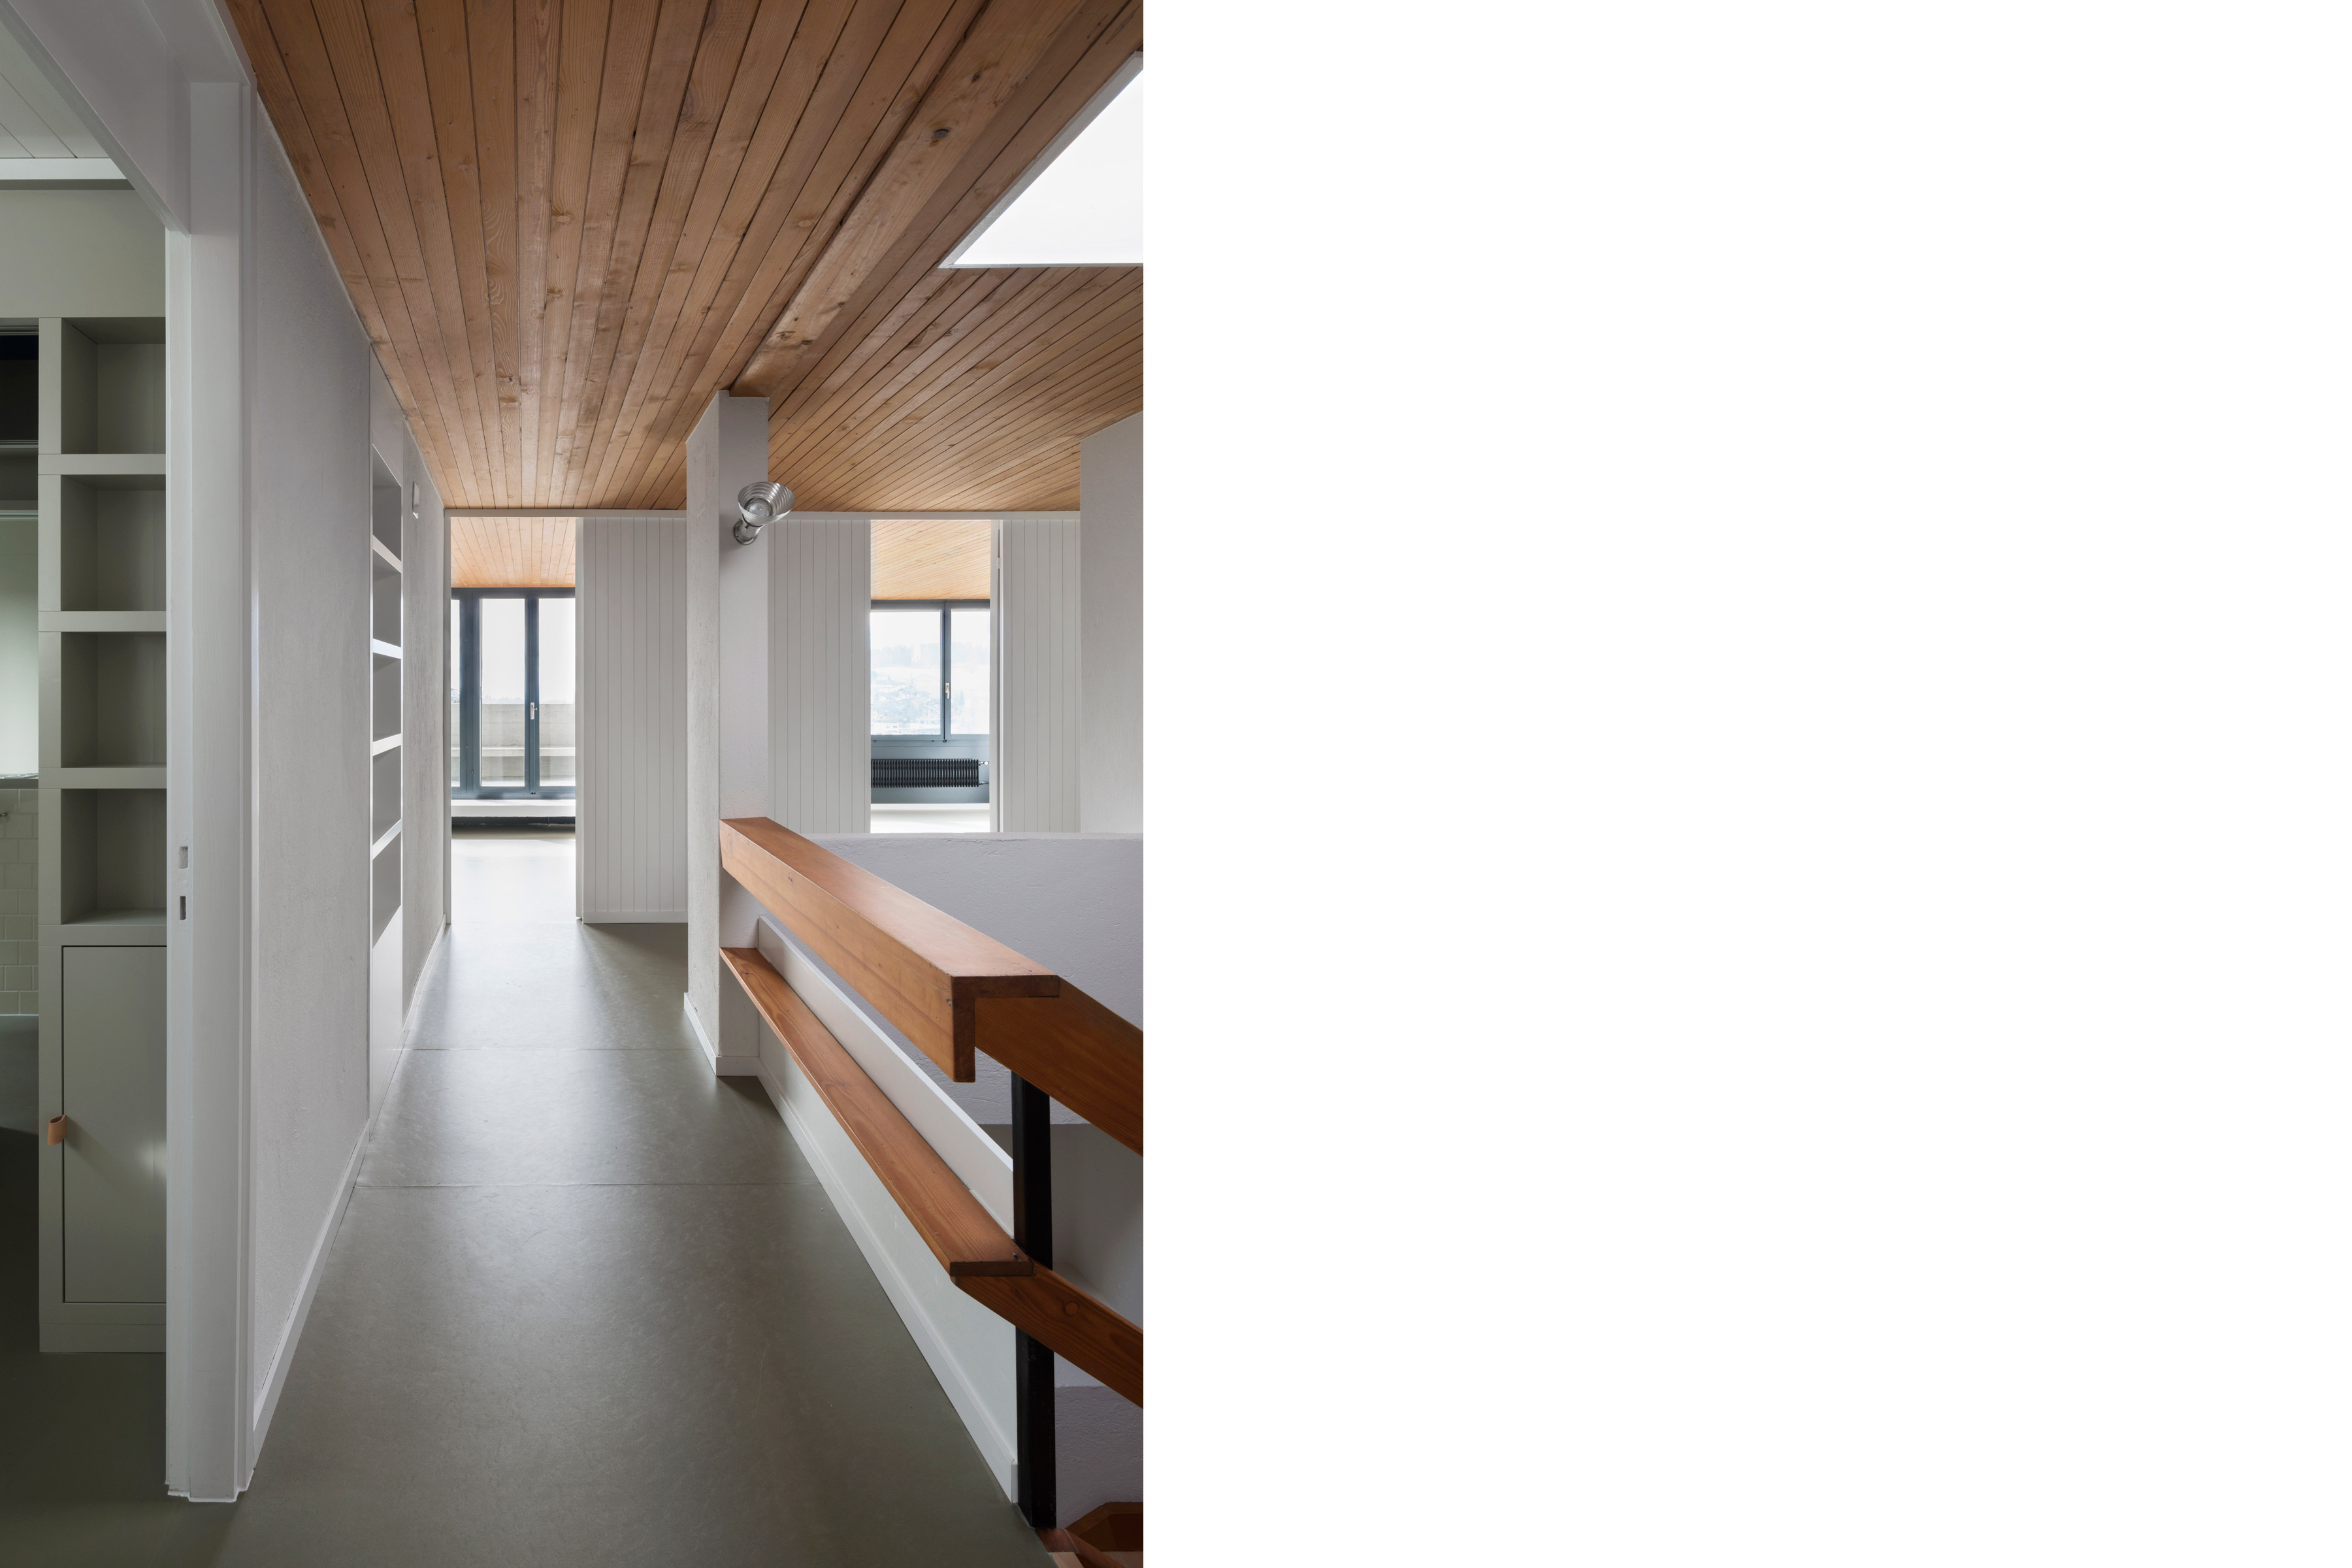 Architecture photo about house Obmatt Adligenswil Luzern